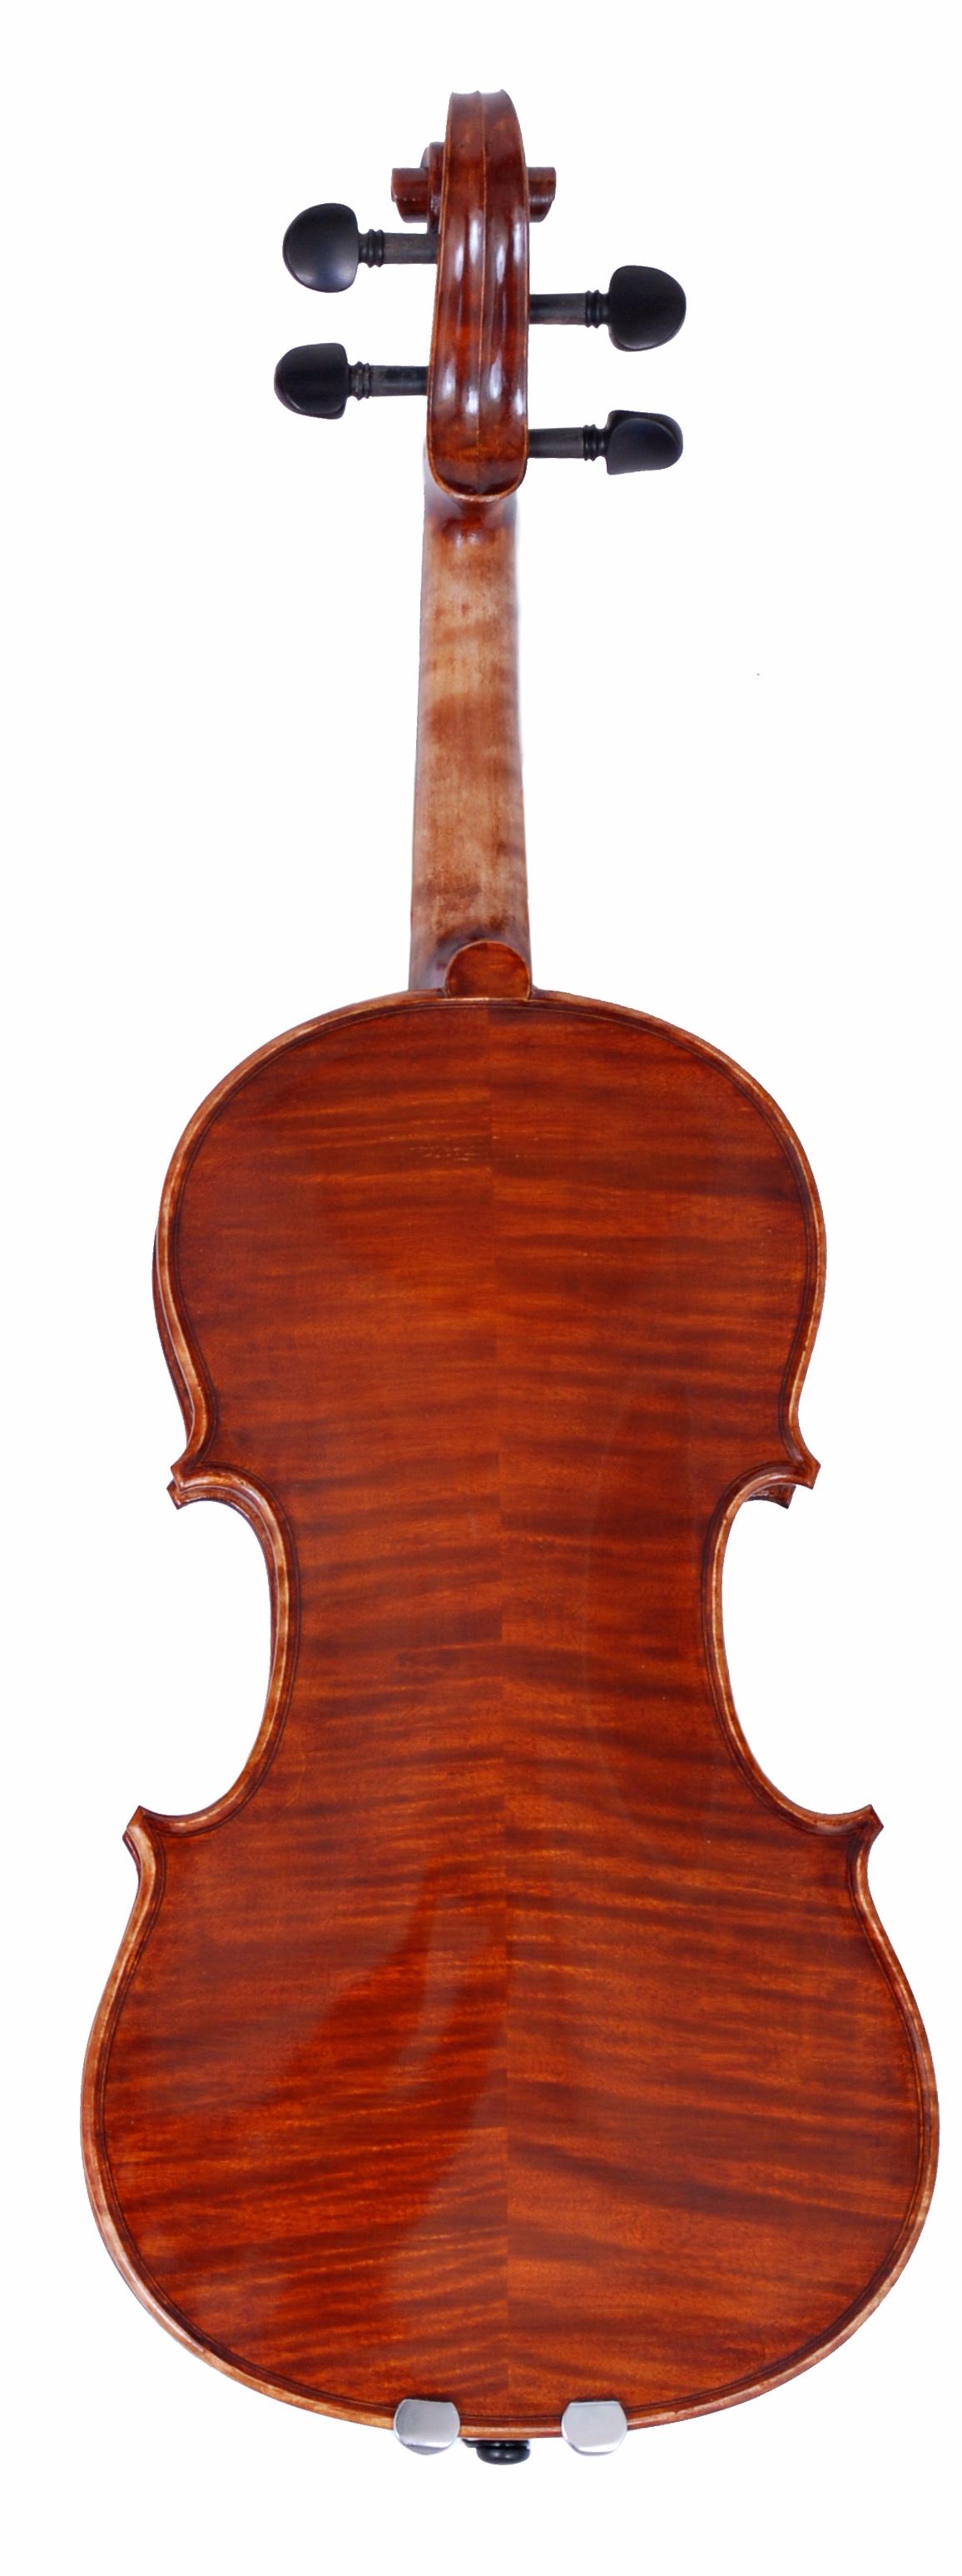 Erwin Otto 8044 violins 2.jpg